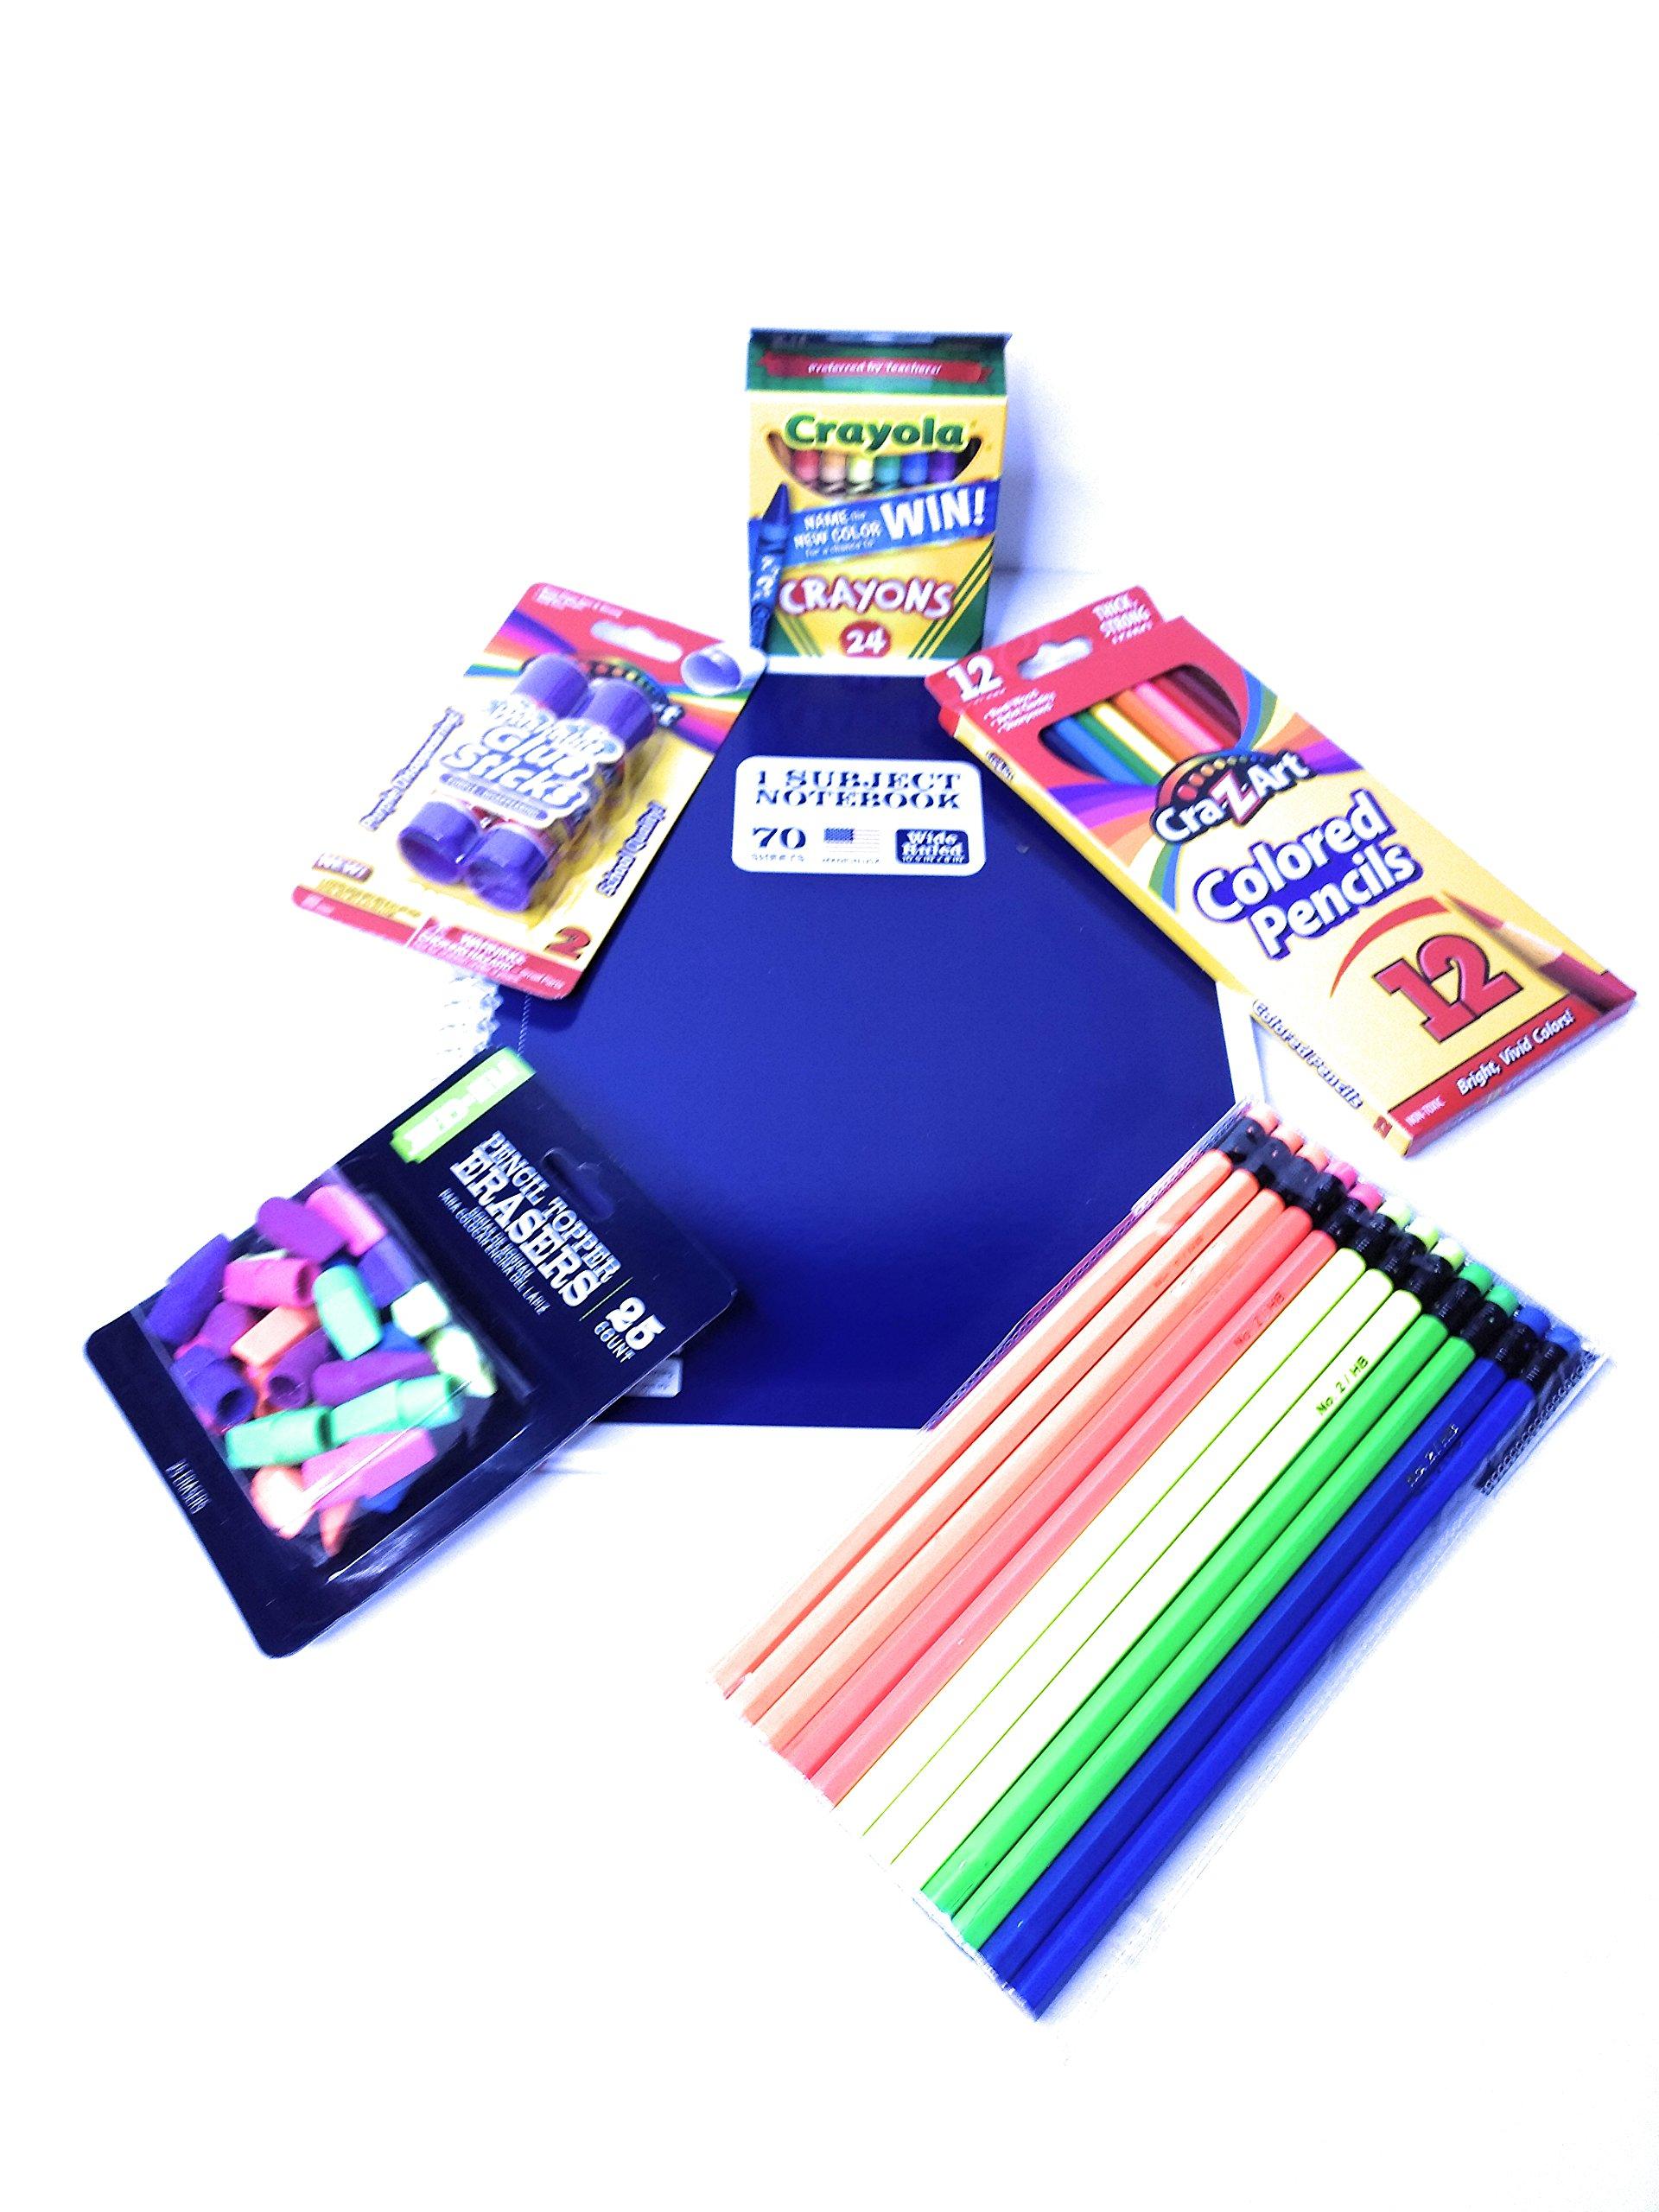 School Supplies Kit K-5 Back to School Bundle of 6 Includes; Crayons, erasers, Pencils, Glue, Notebook,Colored Pencils